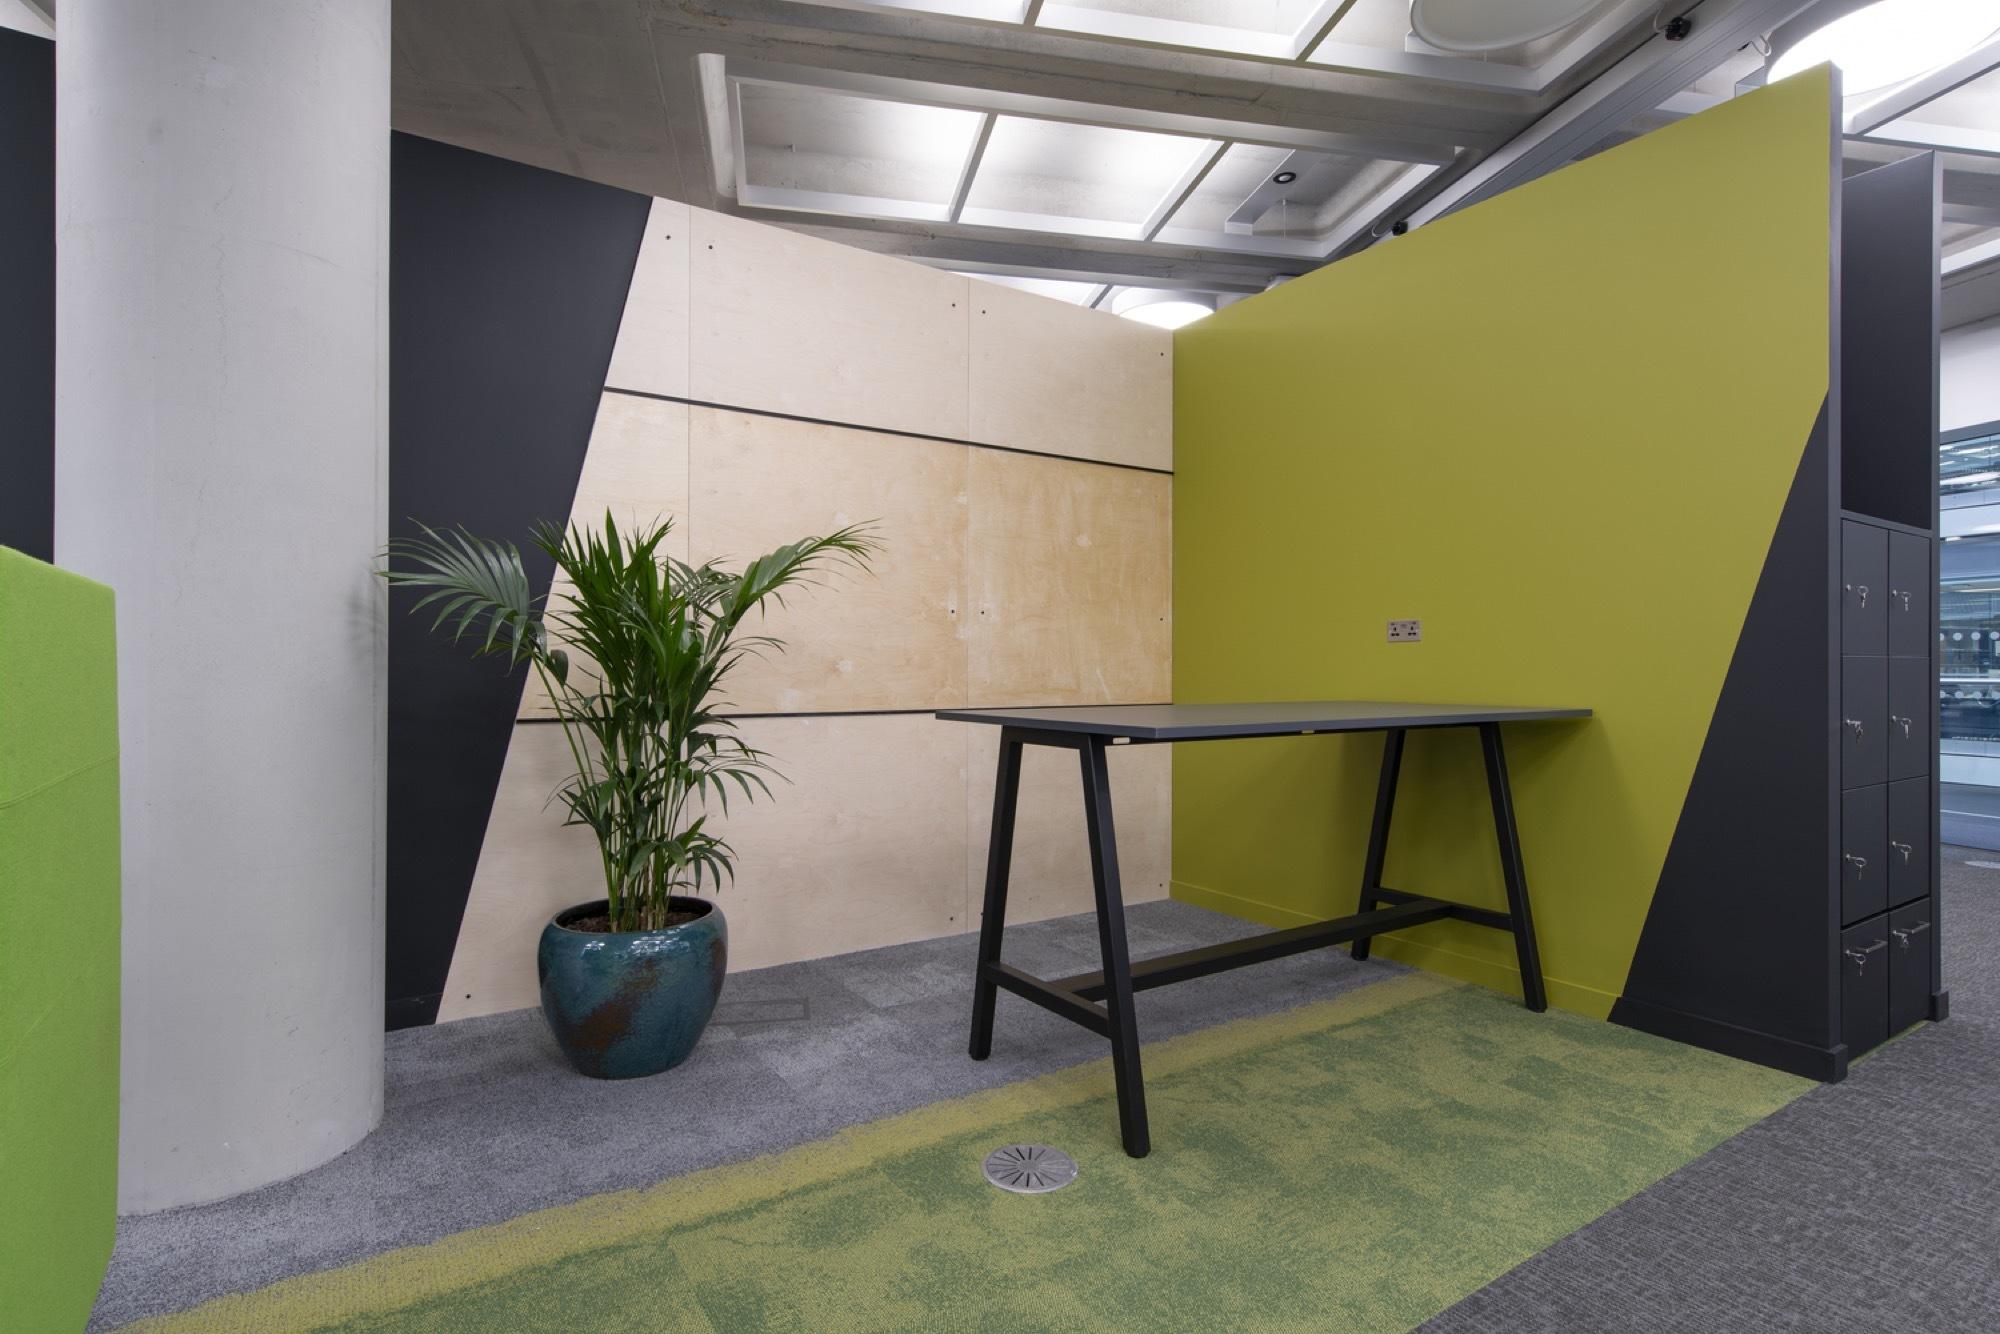 Metapack stand up desk in office refurbishment